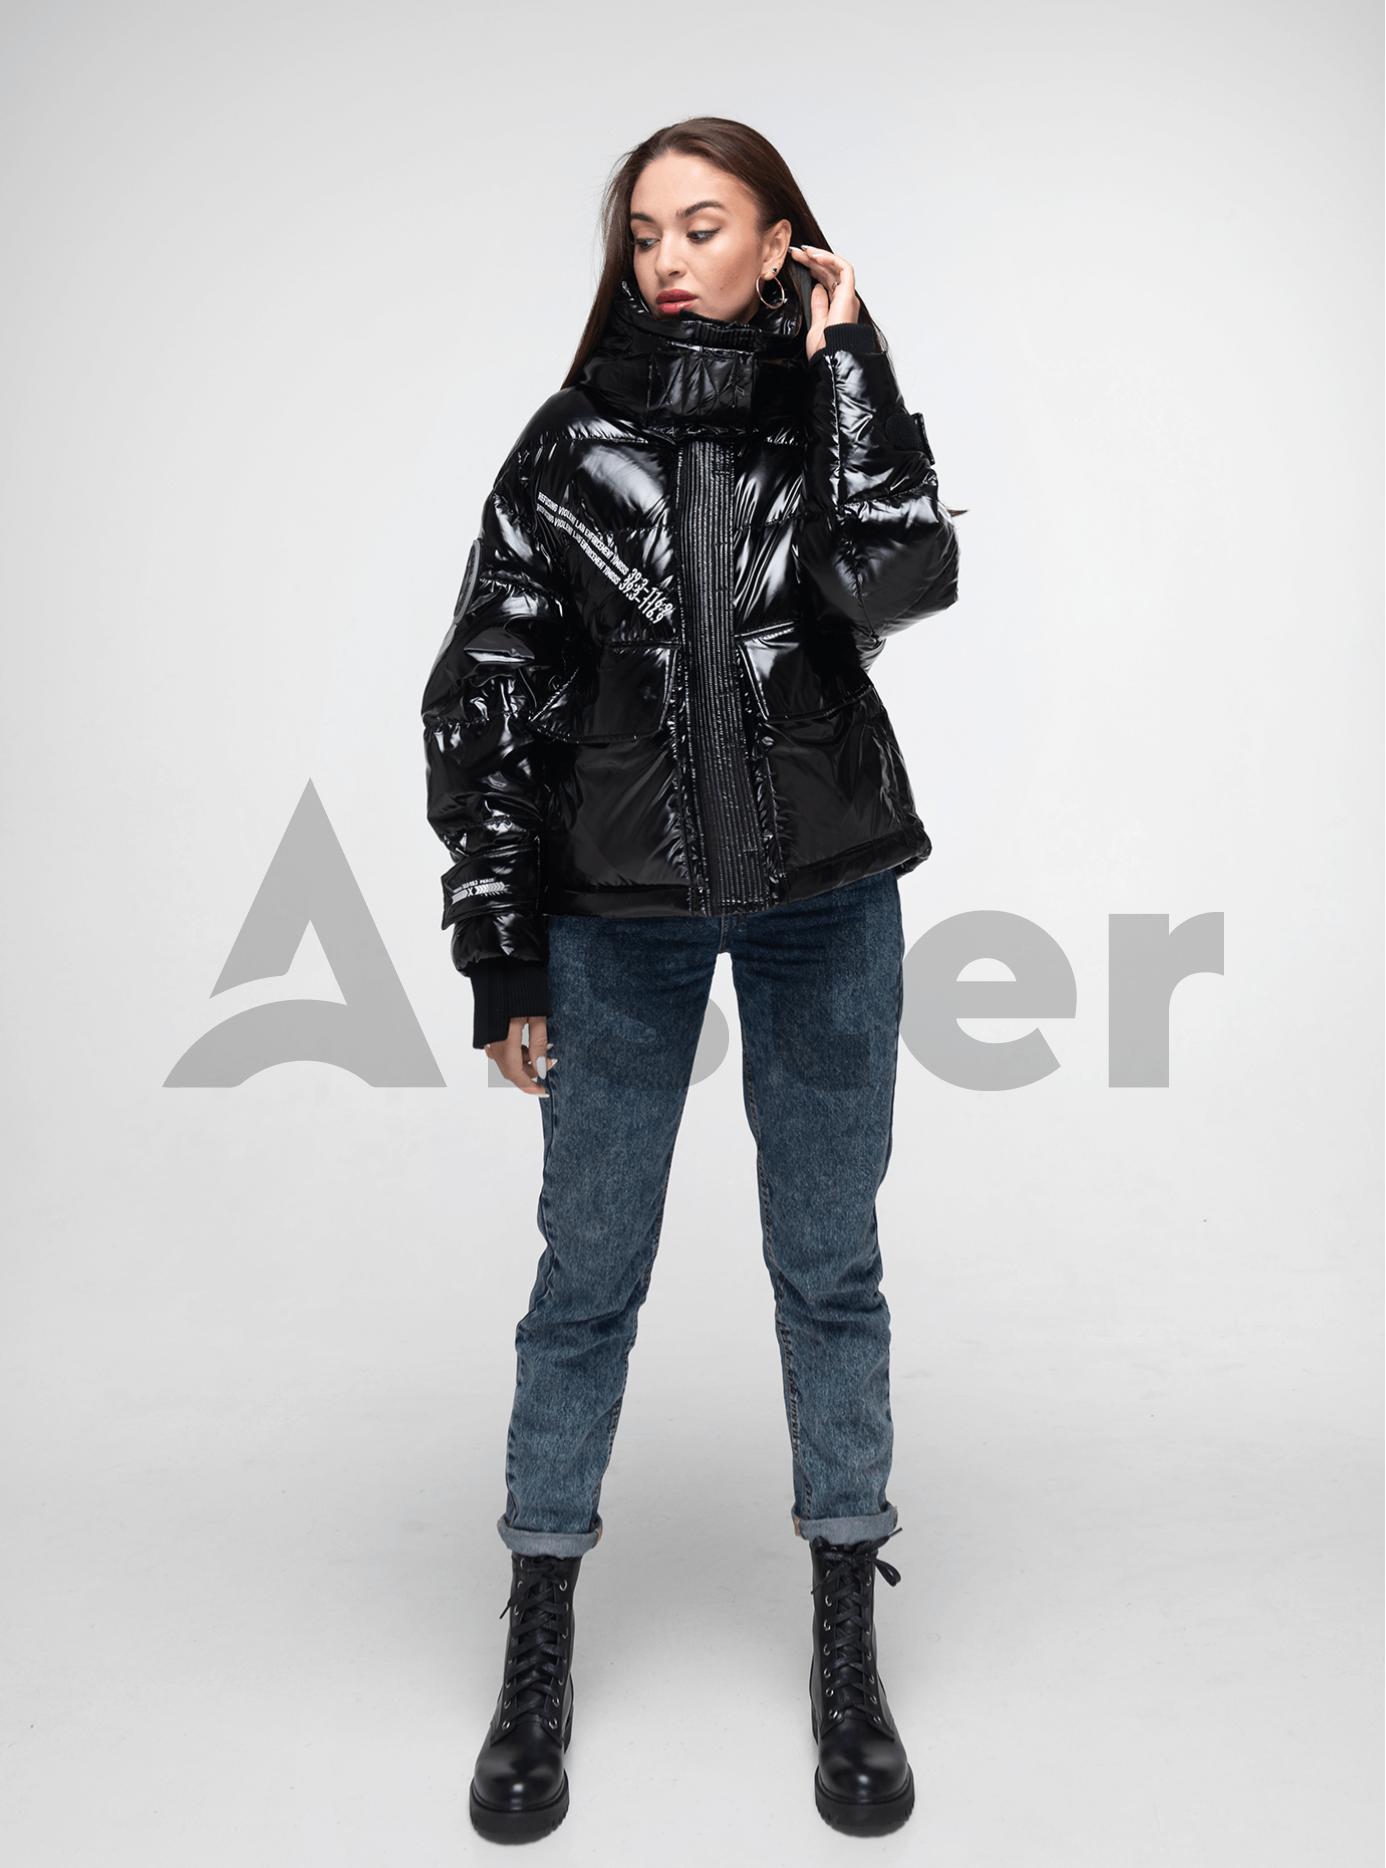 Пуховик зимний короткий Чёрный S (02-Y191111): фото - Alster.ua